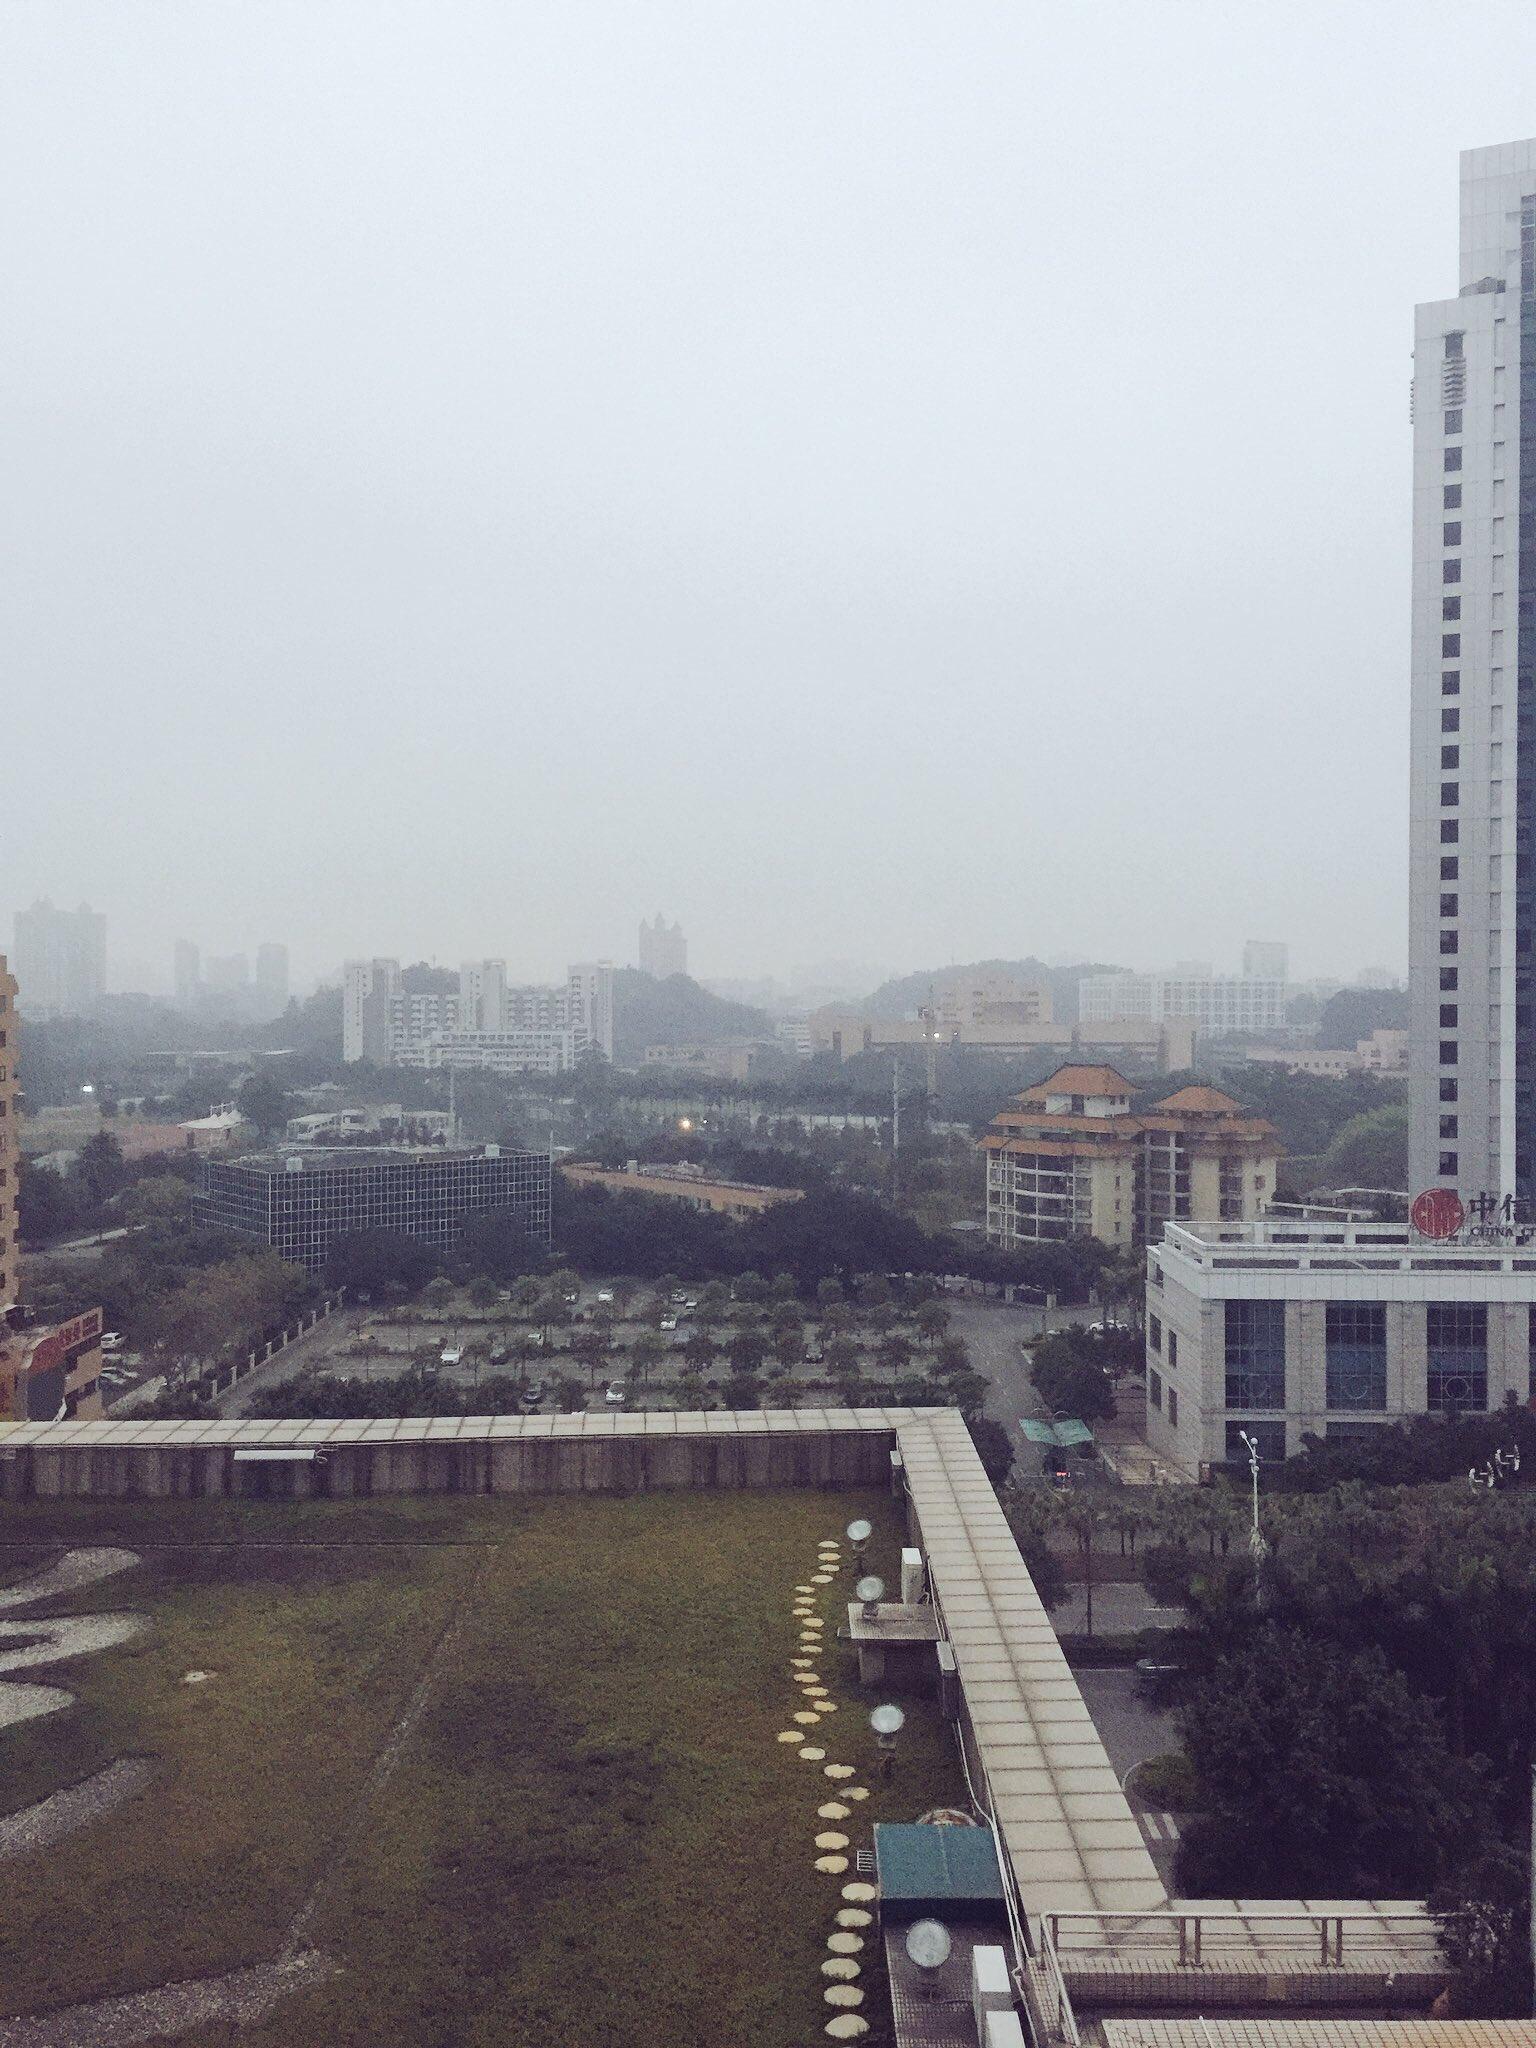 Good morning Jiangmen! #cahht17 https://t.co/GN1nQ02ck3